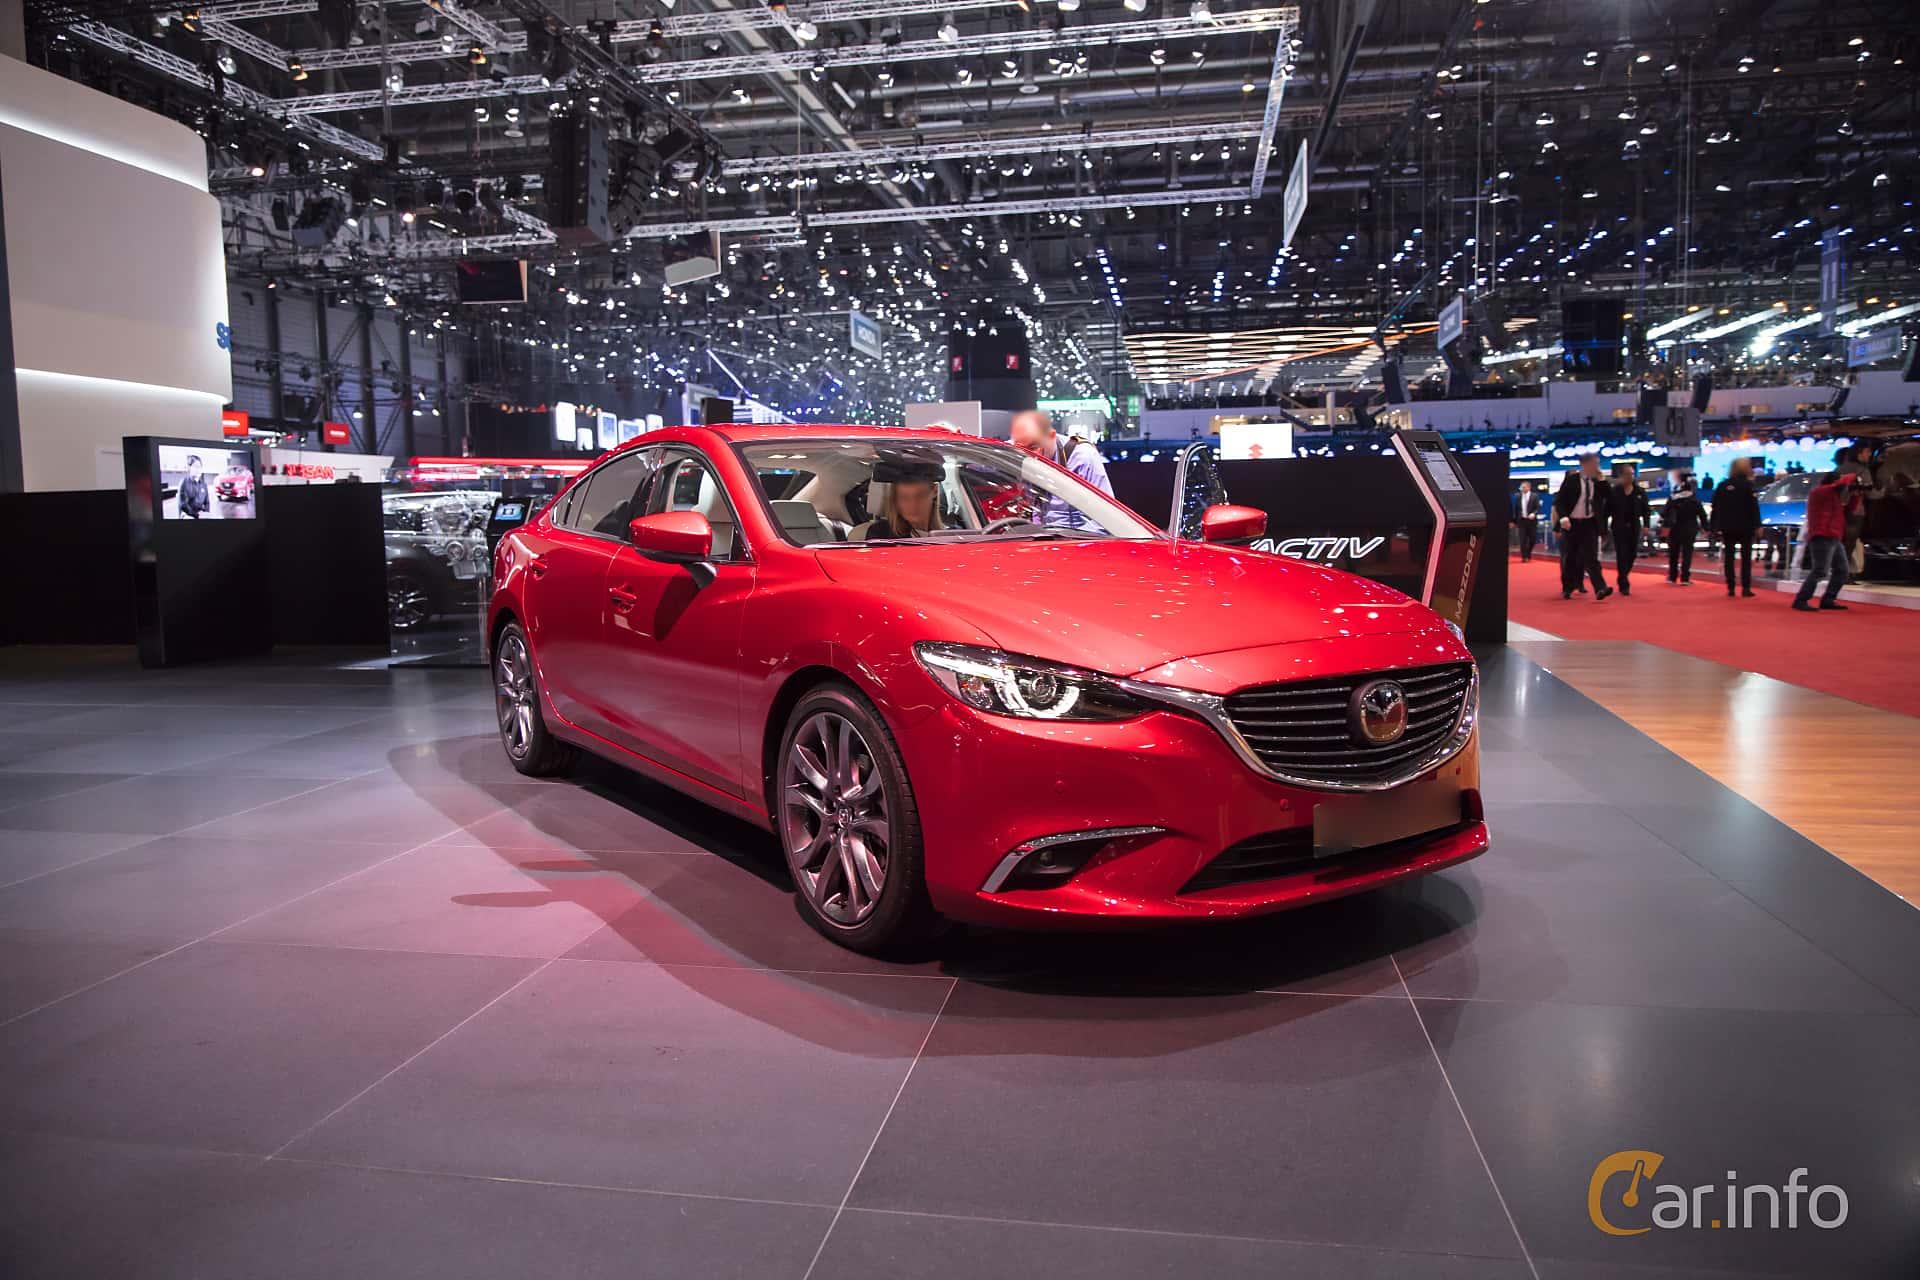 Front/Side  of Mazda 6 Sedan 2.5 SKYACTIV-G Automatic, 192ps, 2017 at Geneva Motor Show 2017